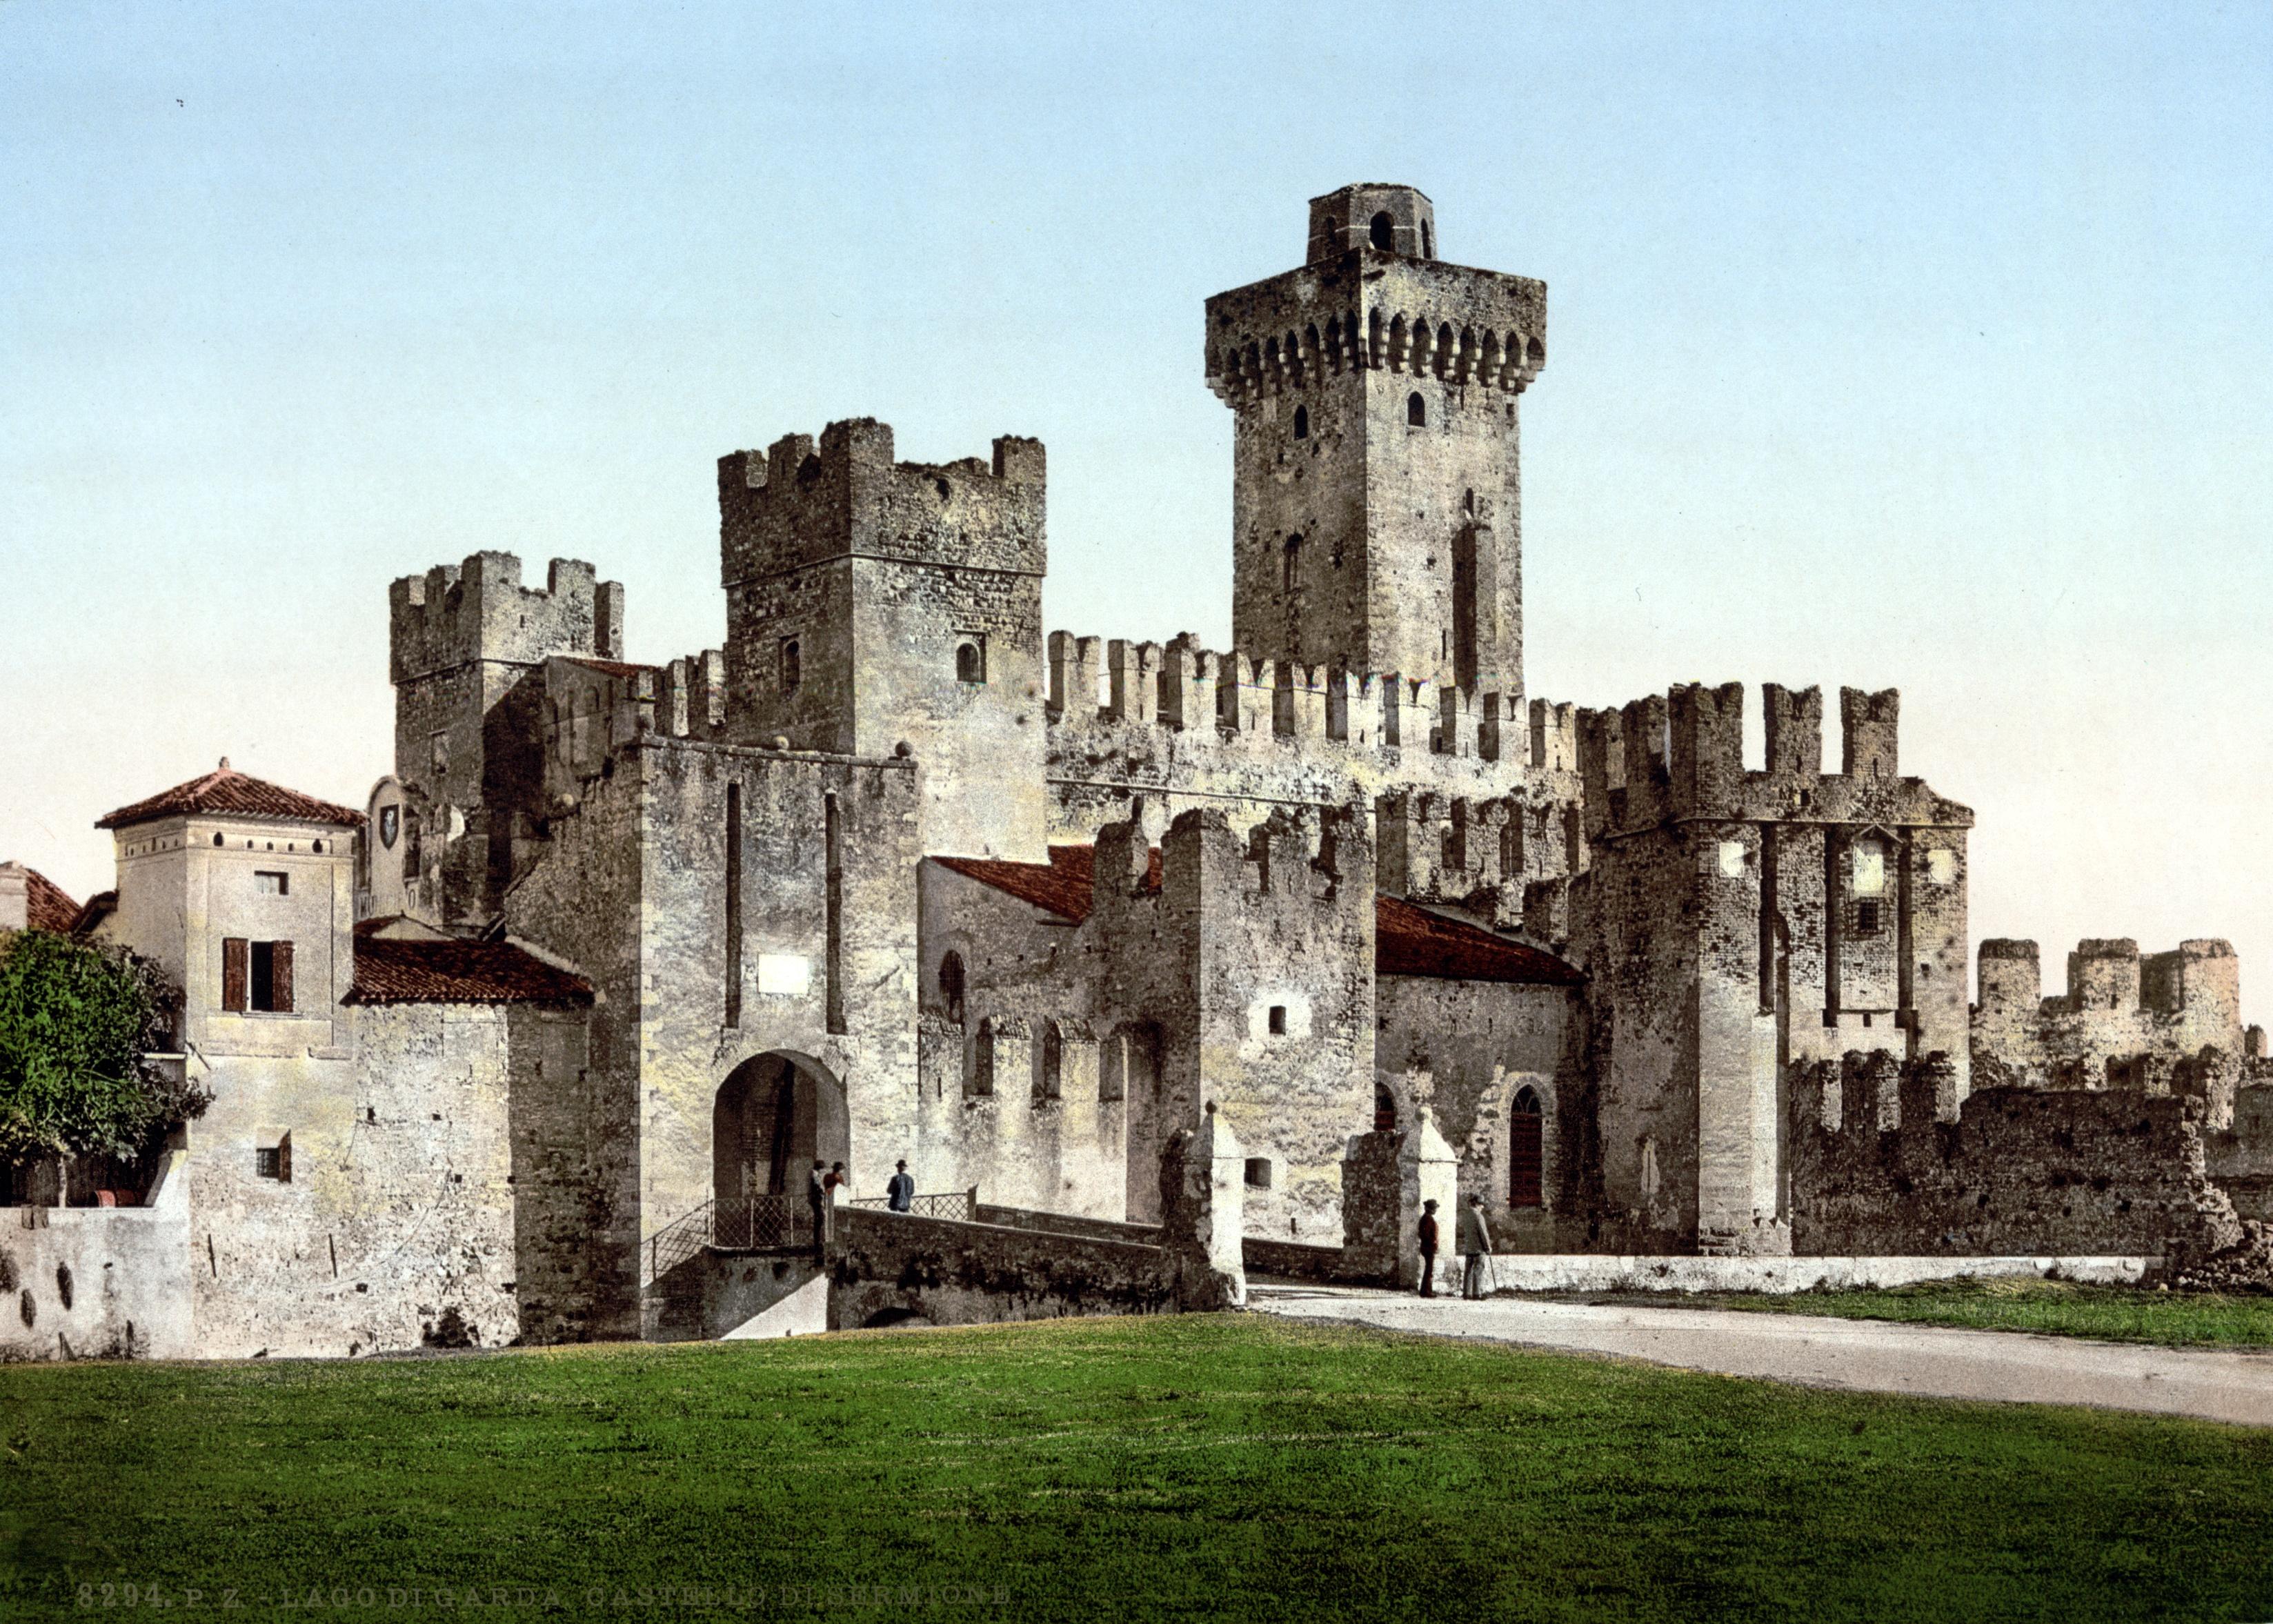 File:Sirmione Castello Scaligero um 1900.jpg - Wikimedia ...